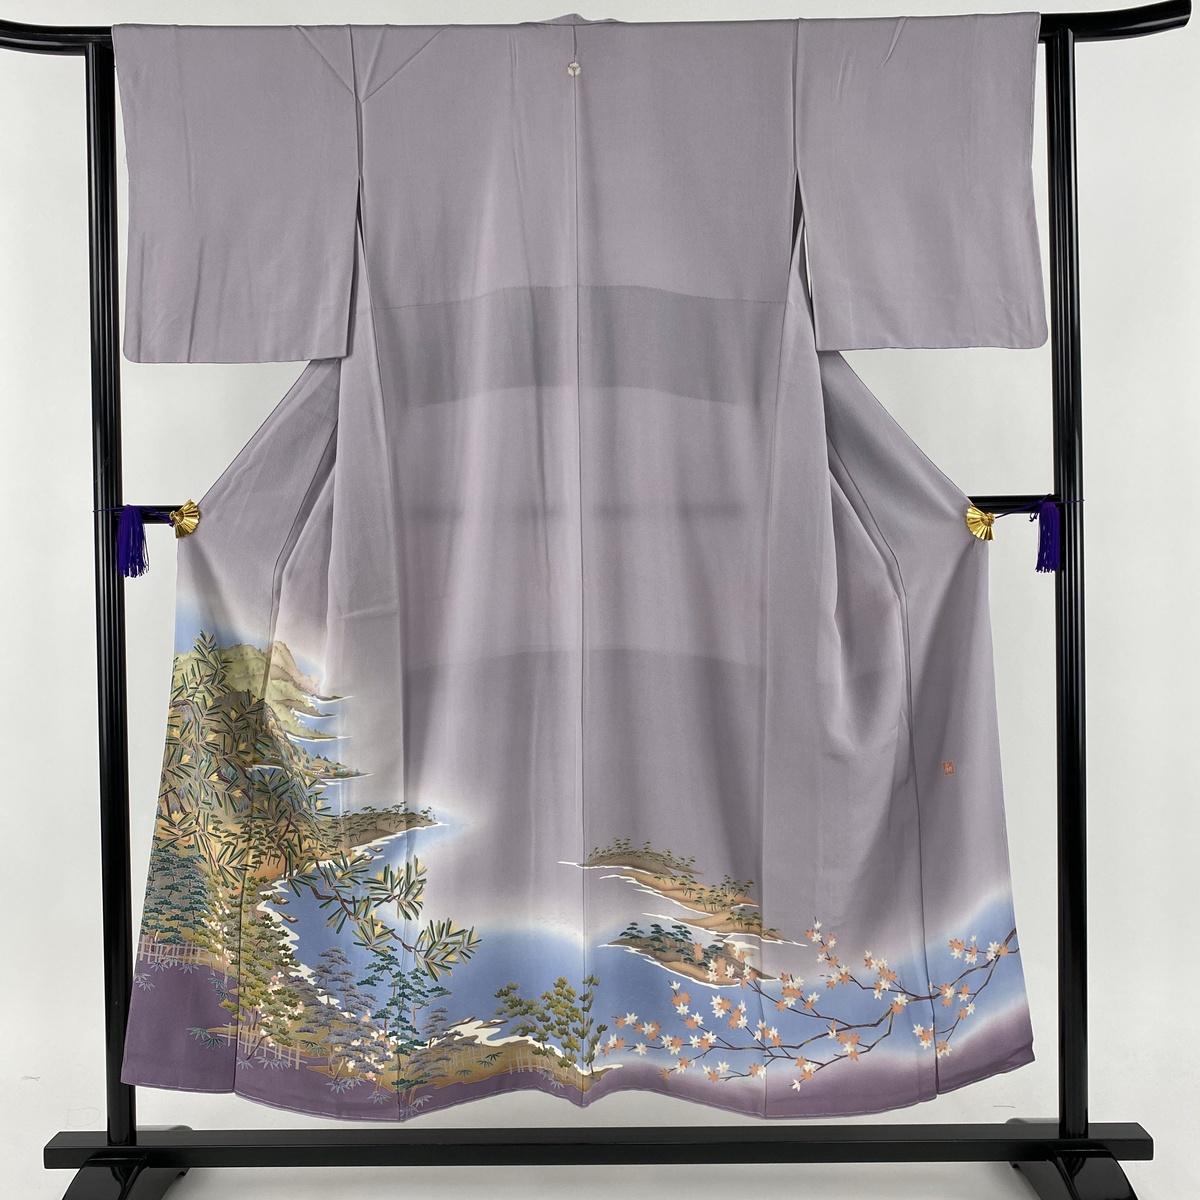 色留袖 美品 秀品 落款あり 一つ紋 海辺の風景 松 縮緬 薄紫 袷 身丈152.5cm 裄丈63cm S 正絹 【中古】